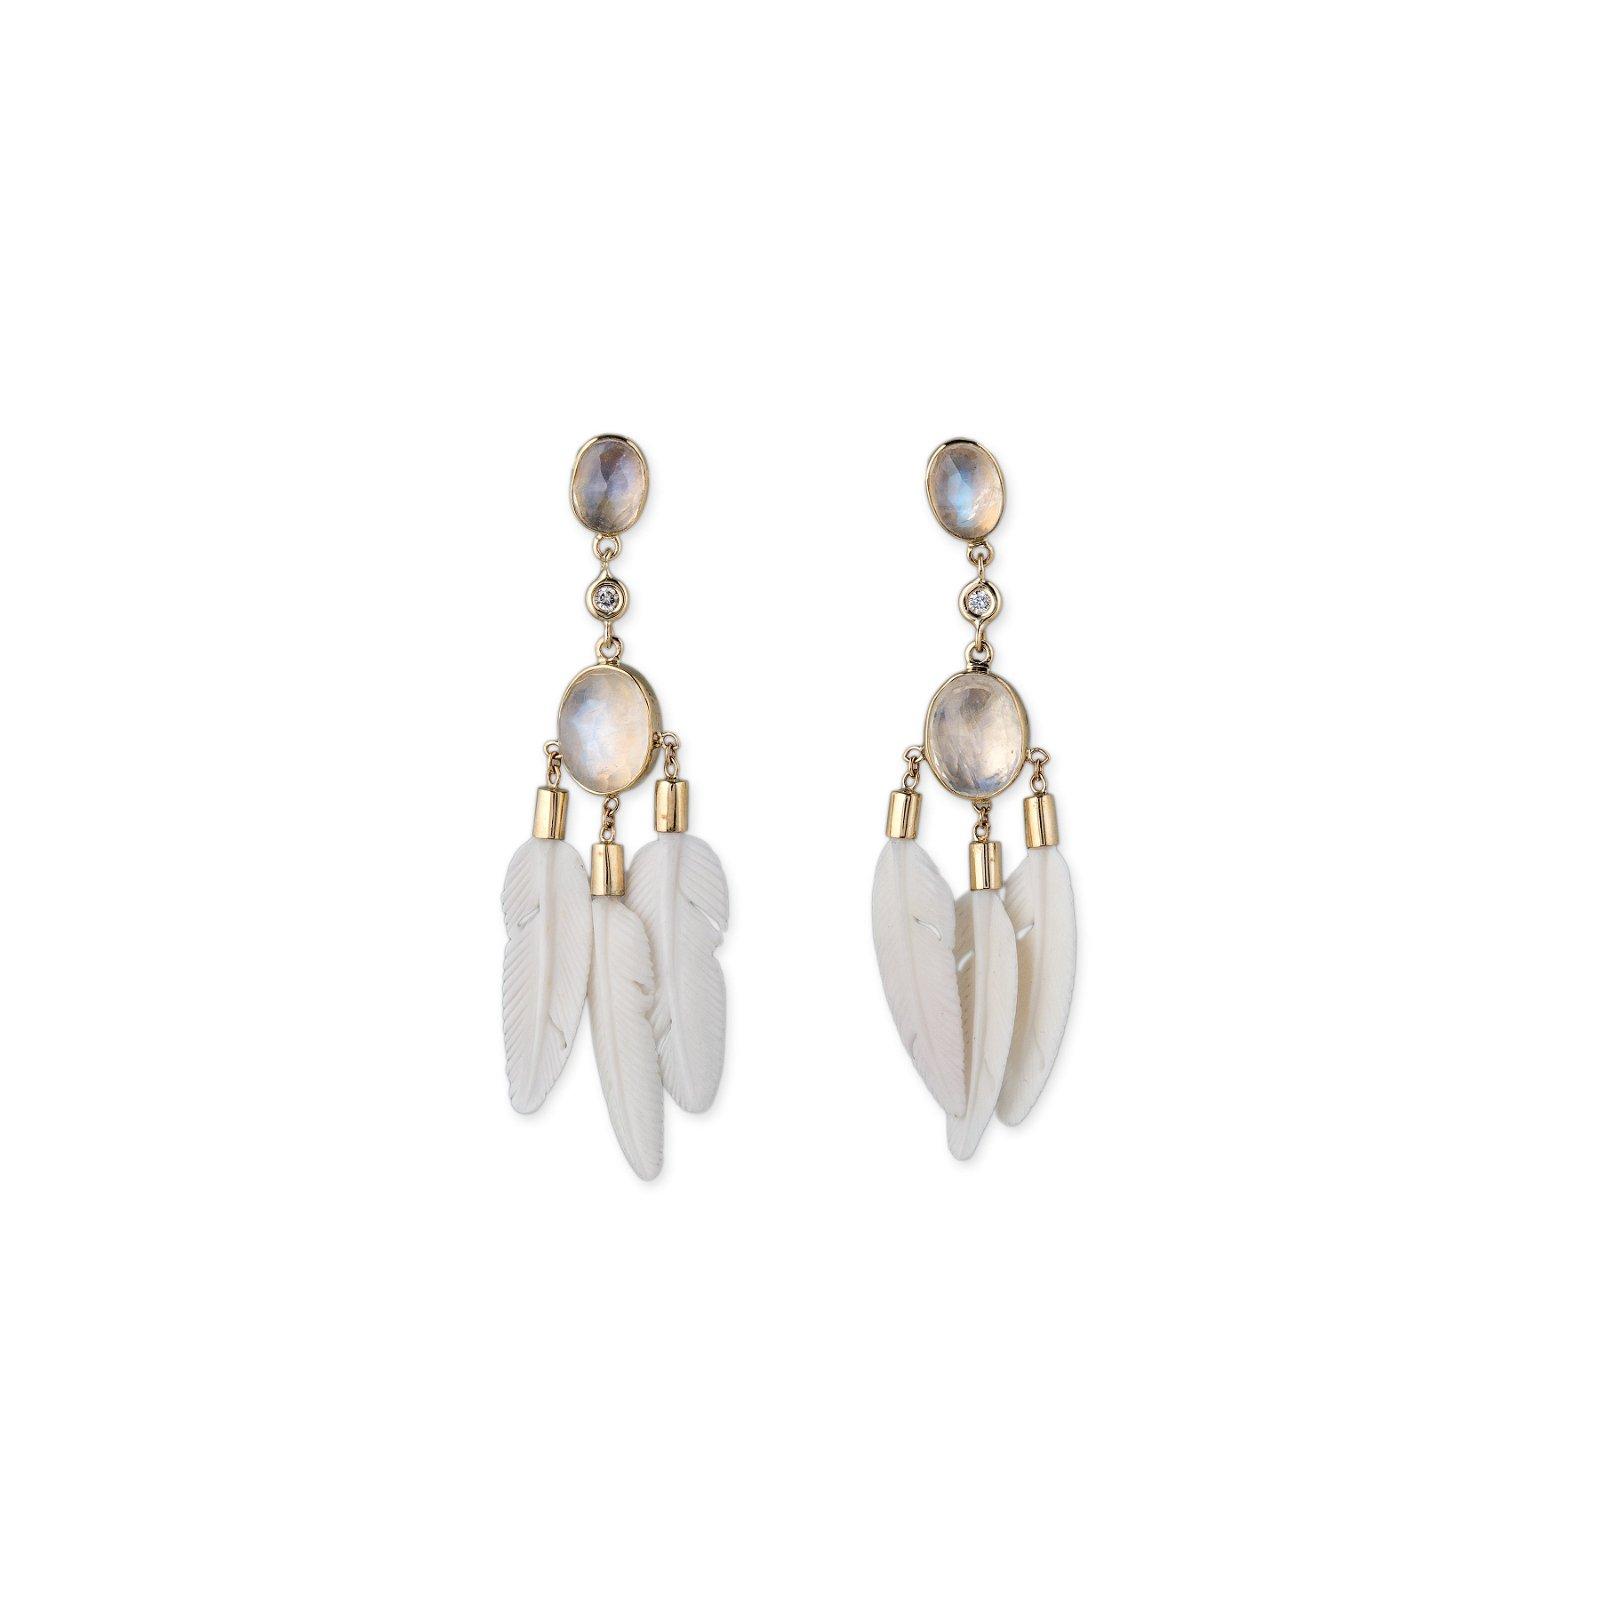 Image of Moonstone Bone Feather Earrings